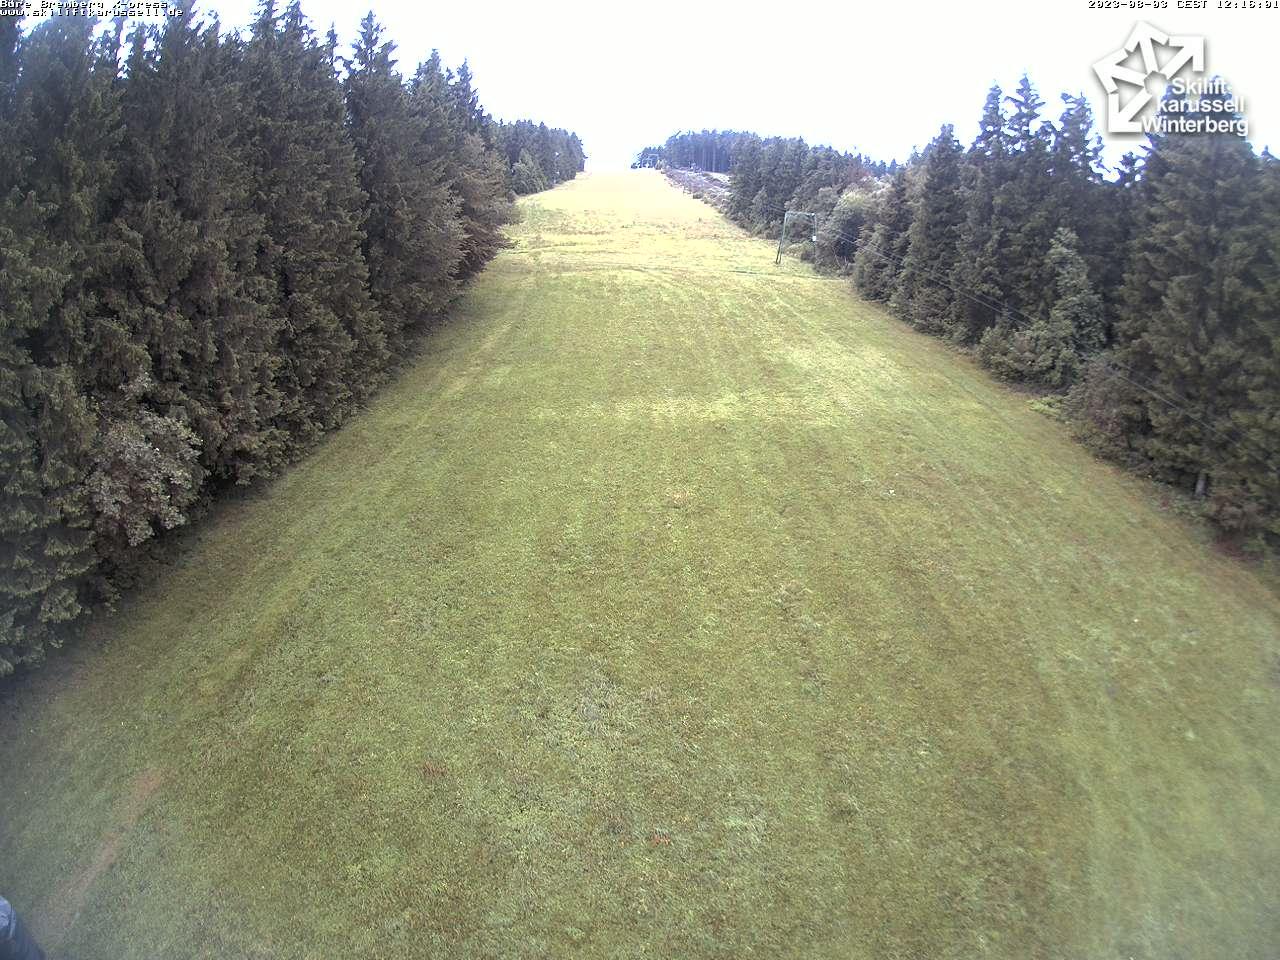 Bremberglift, Winterberg